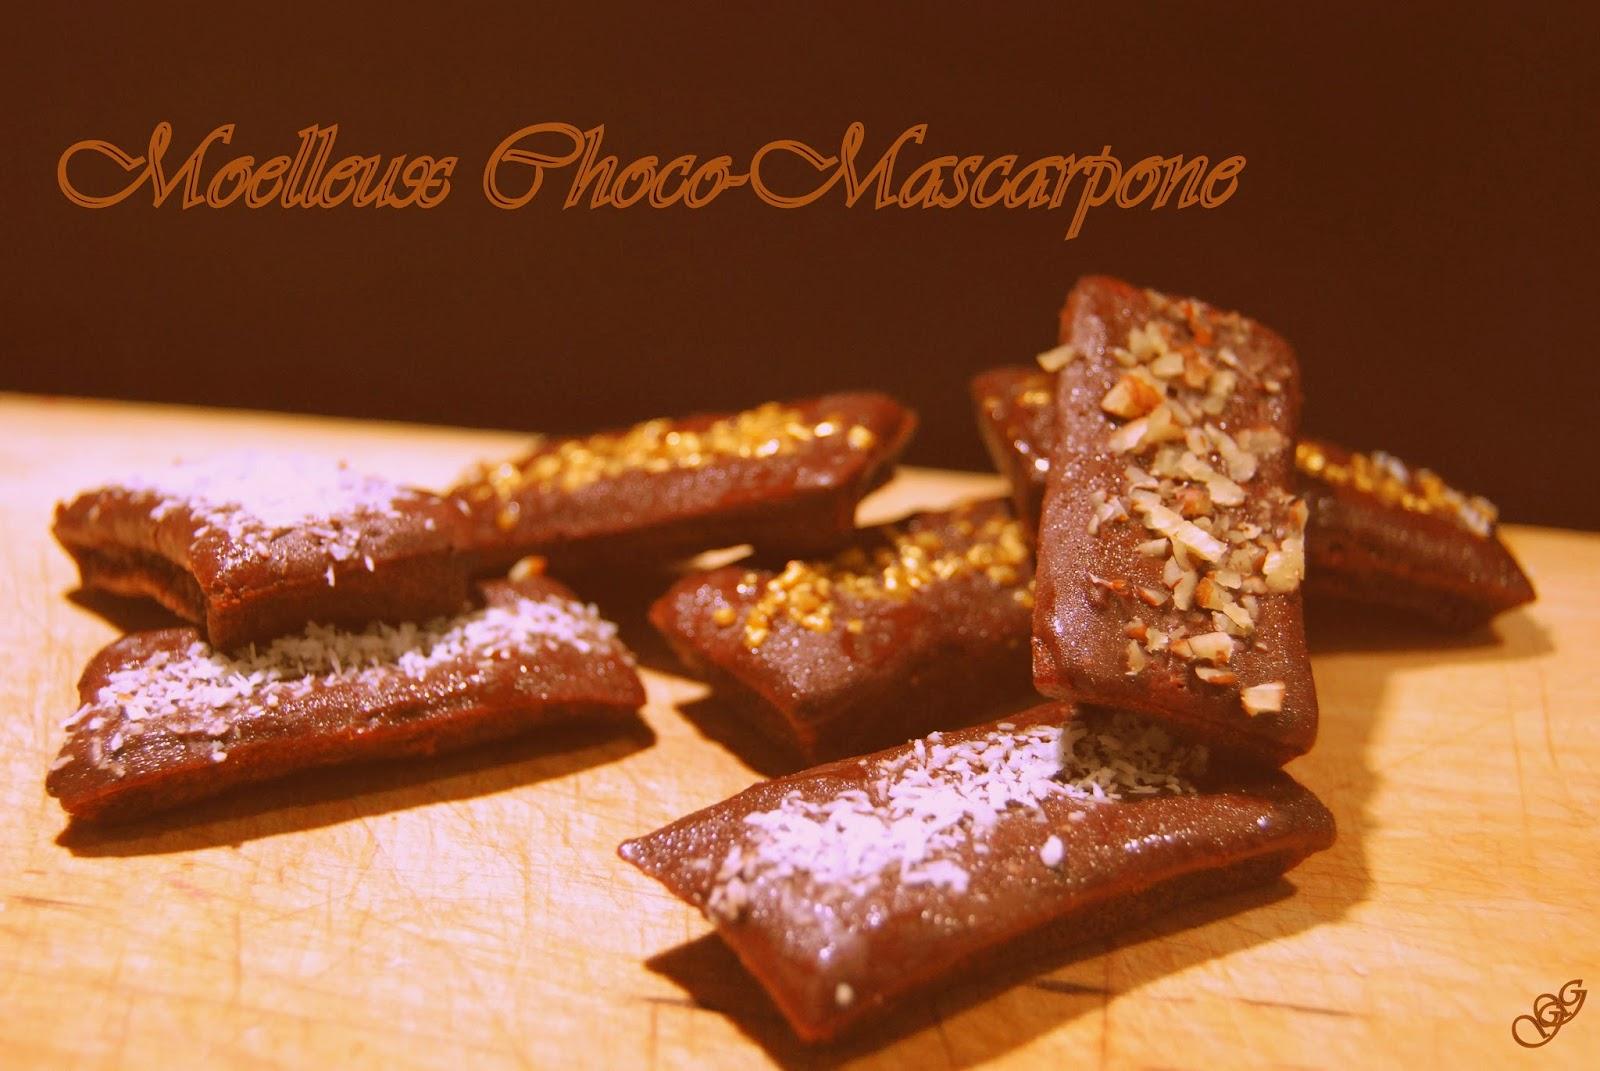 Moelleux Choco-Mascarpone